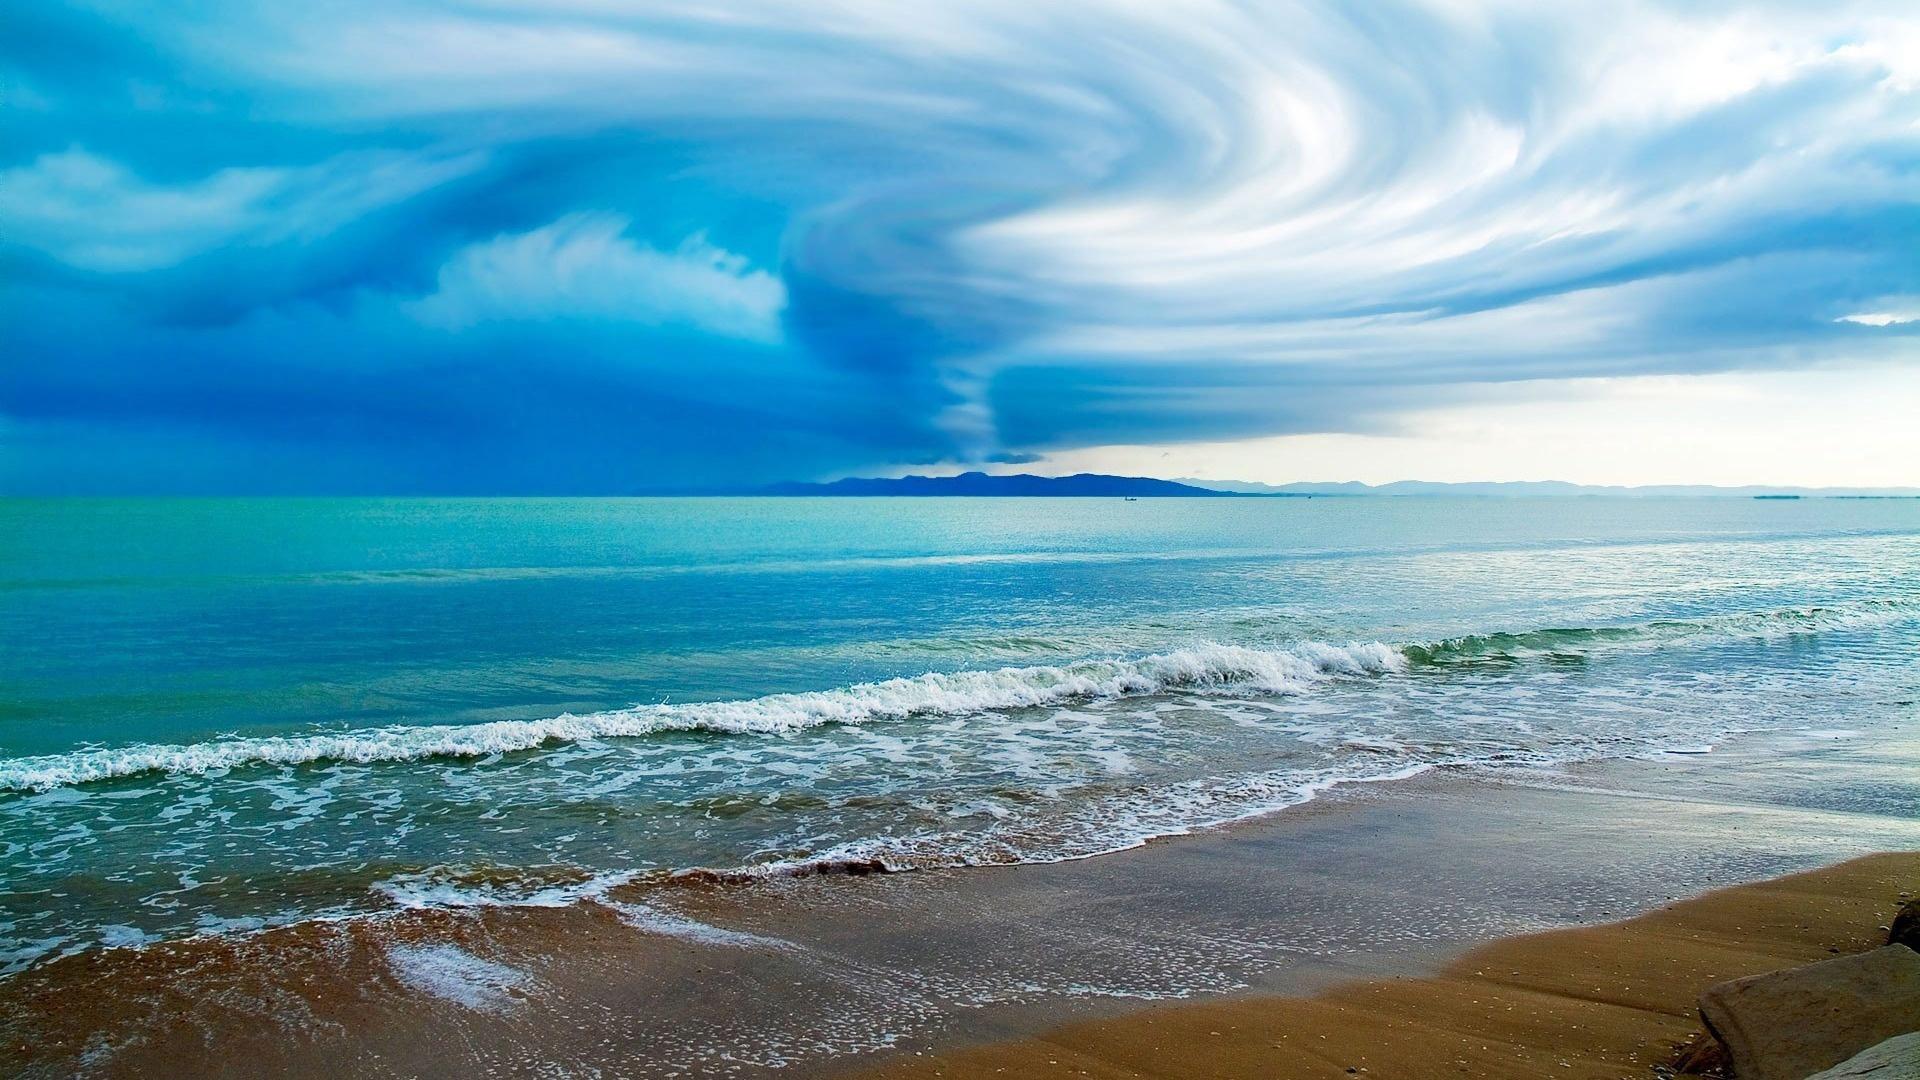 Wallpaper beach wave water Desktop HD Desktop Wallpapers 1920x1080